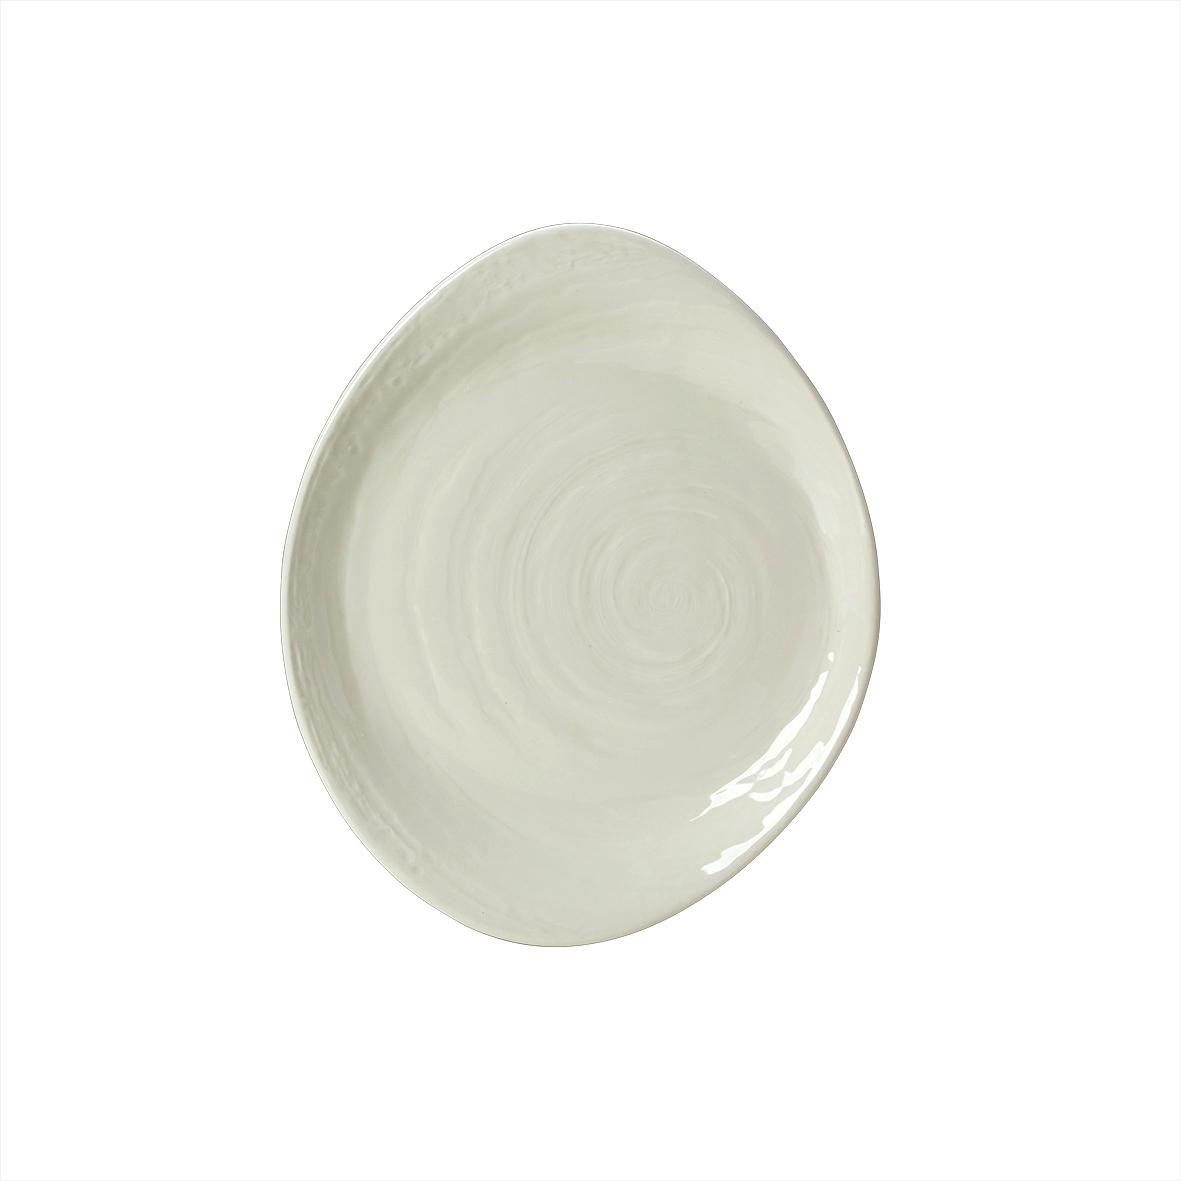 Онлайн каталог PROMENU: Тарелка фарфоровая Steelite Scape, 15,5 см                               1401X0063